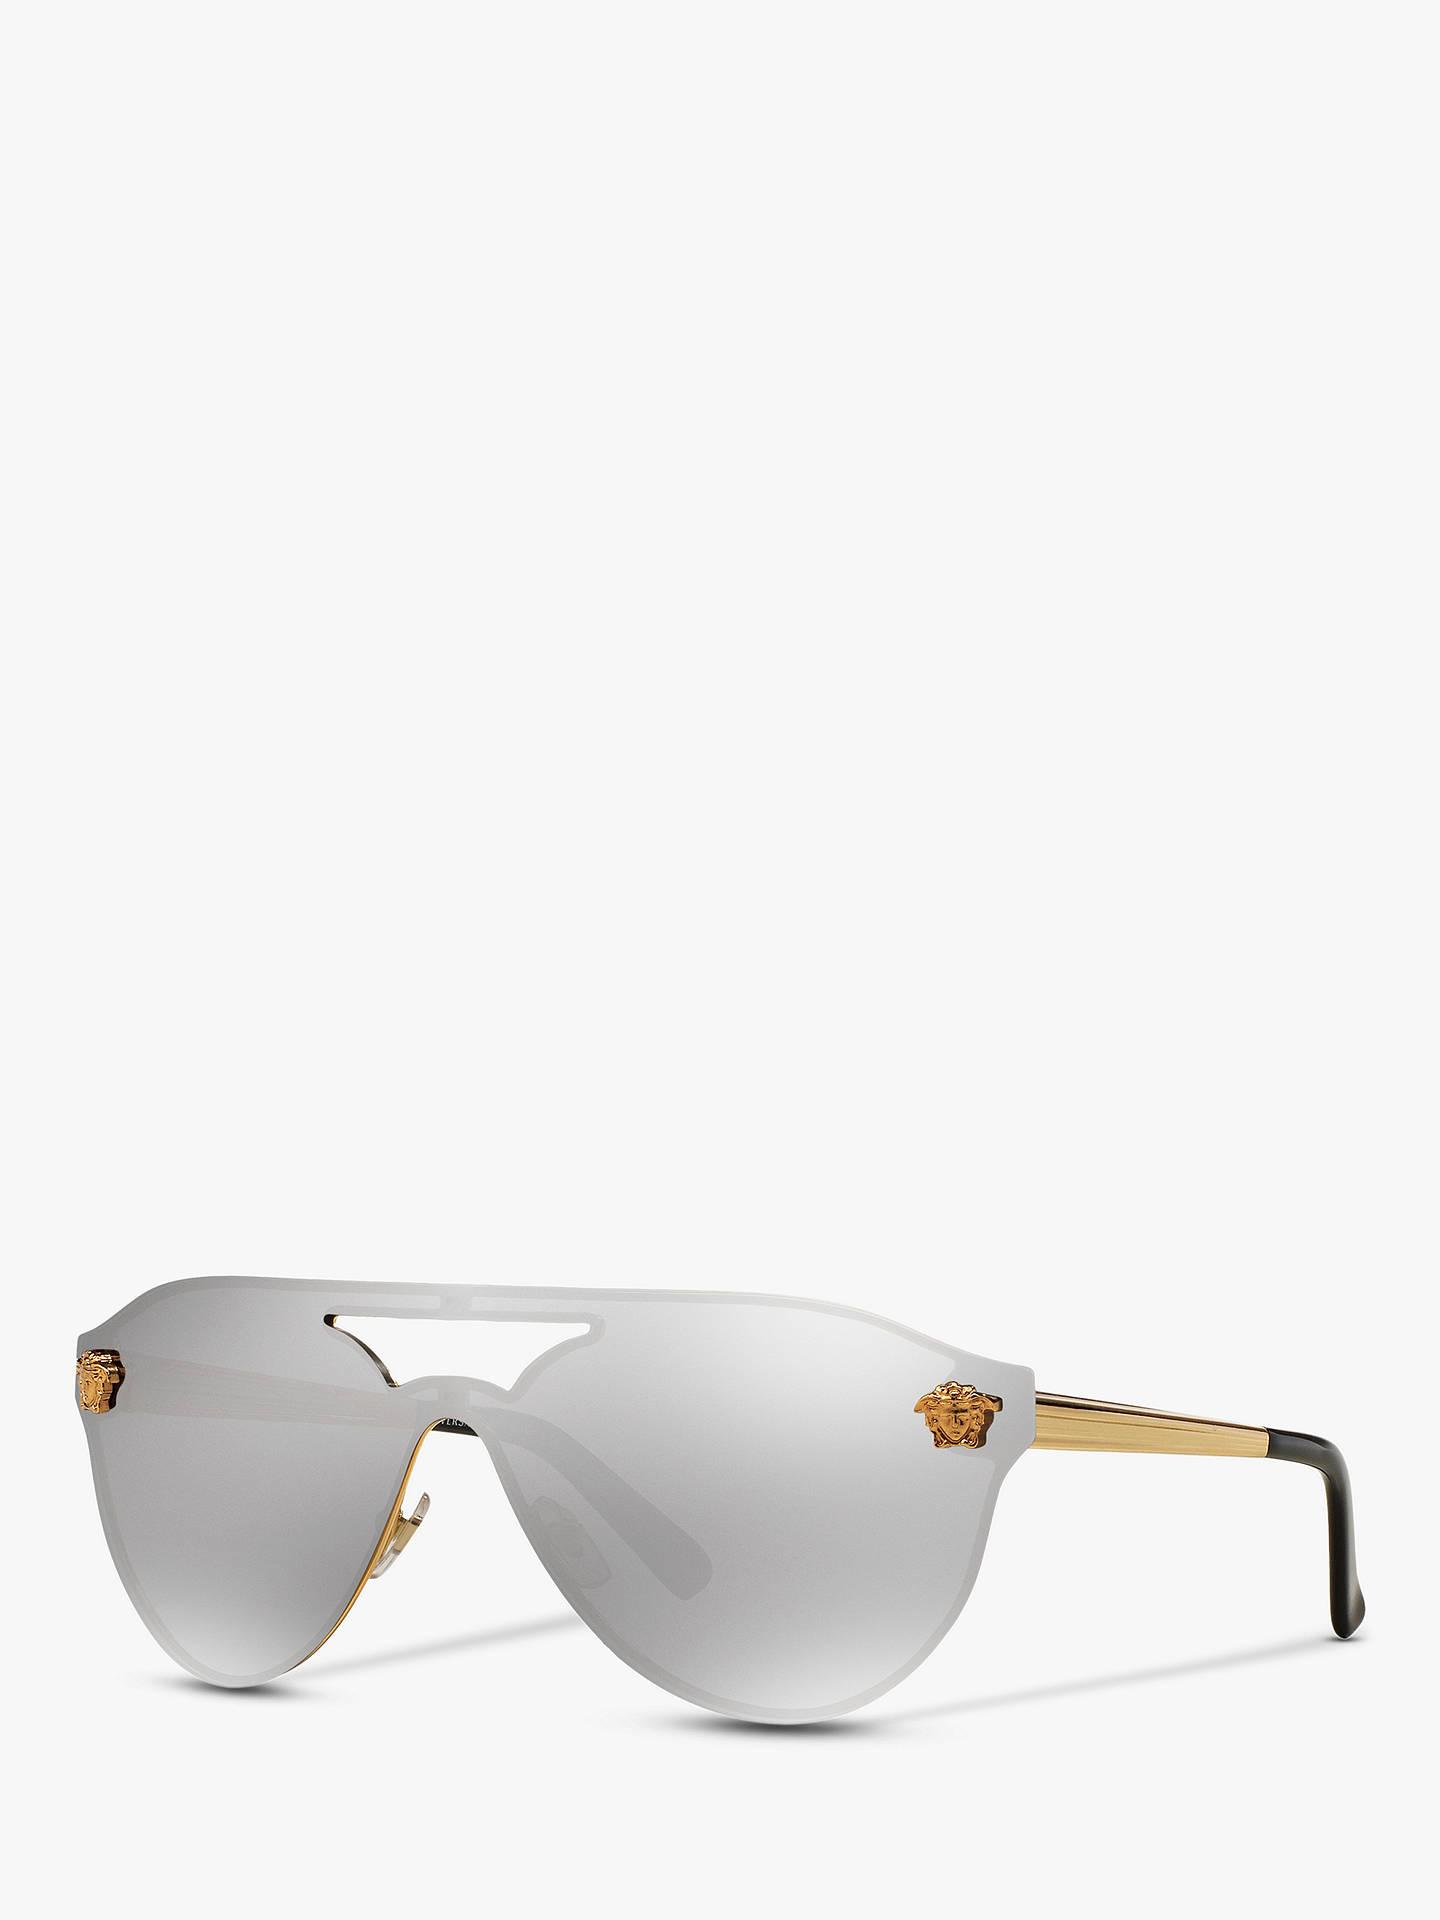 d27b001aa2dd6 Buy Versace VE2161B Women s Studded Rectangular Sunglasses